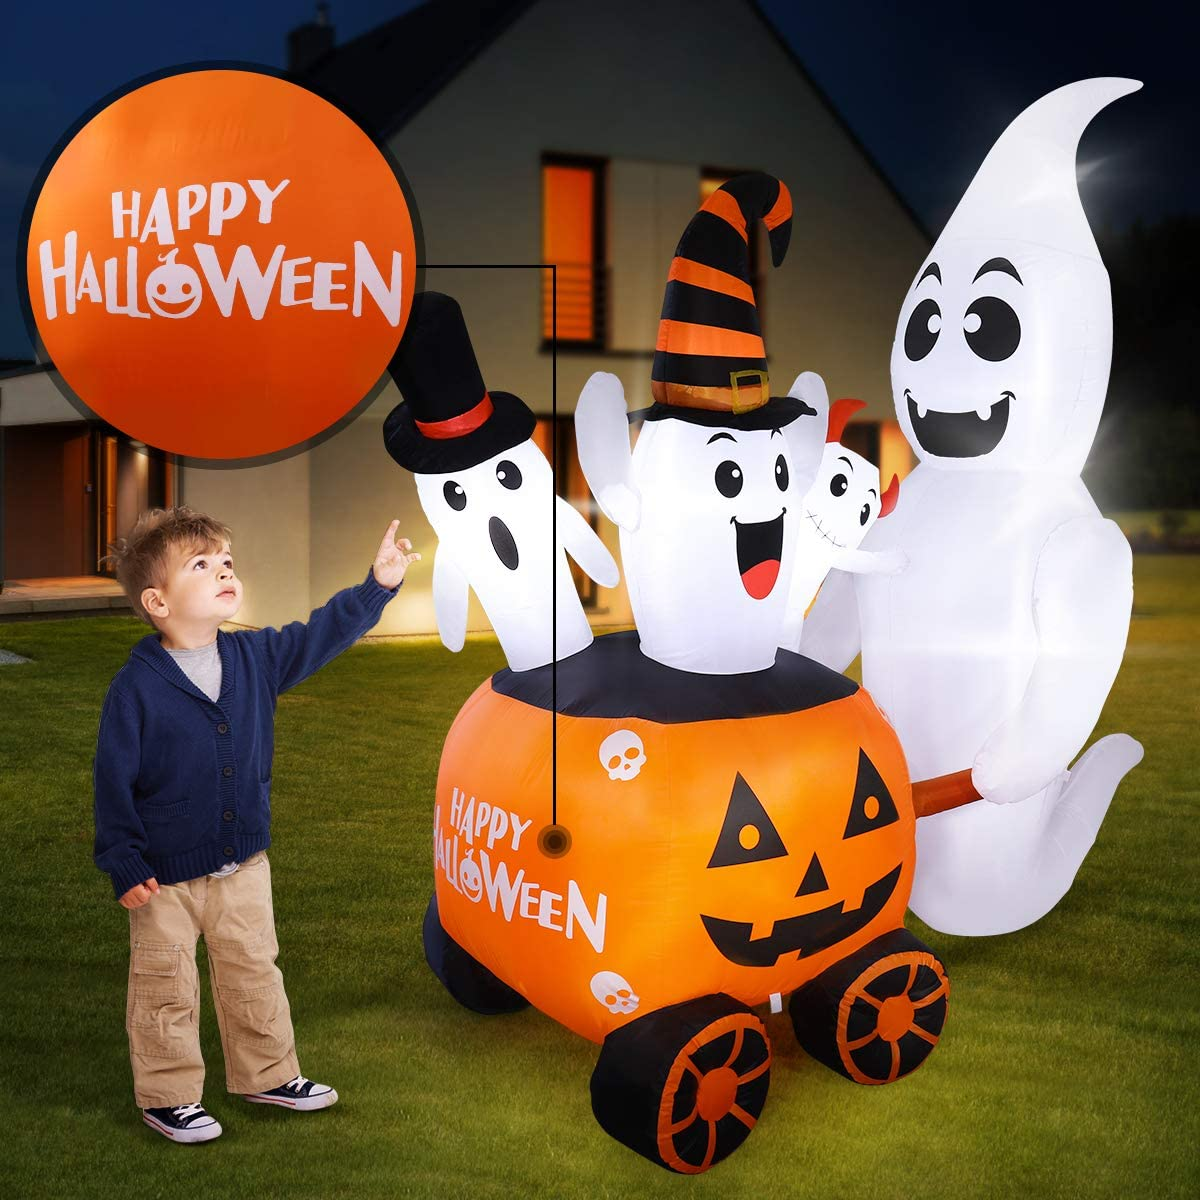 Halloween Inflatables Outdoor Decorations 6FT Halloween Blow Up Pumpkin Ghost Decoration with Happy Halloween Design